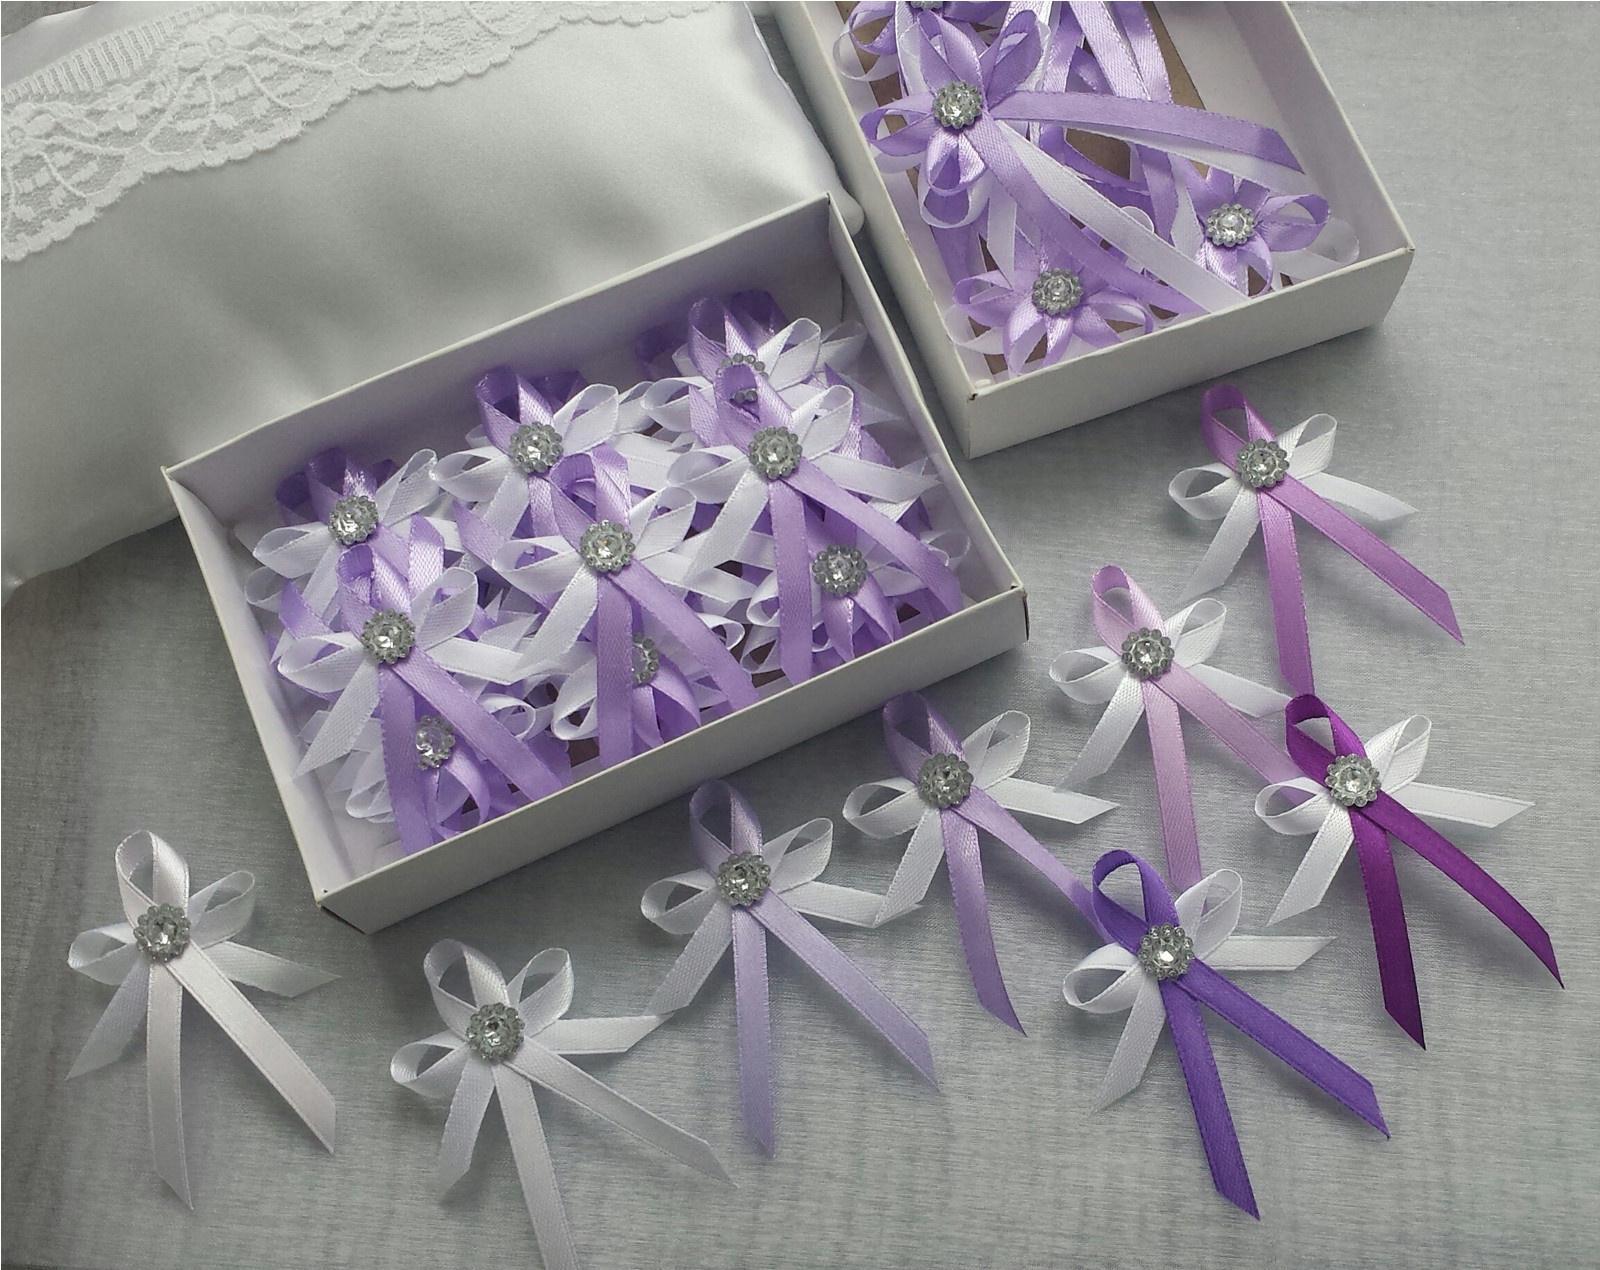 Svetlá lila vývazky s brožičkou - Obrázek č. 1